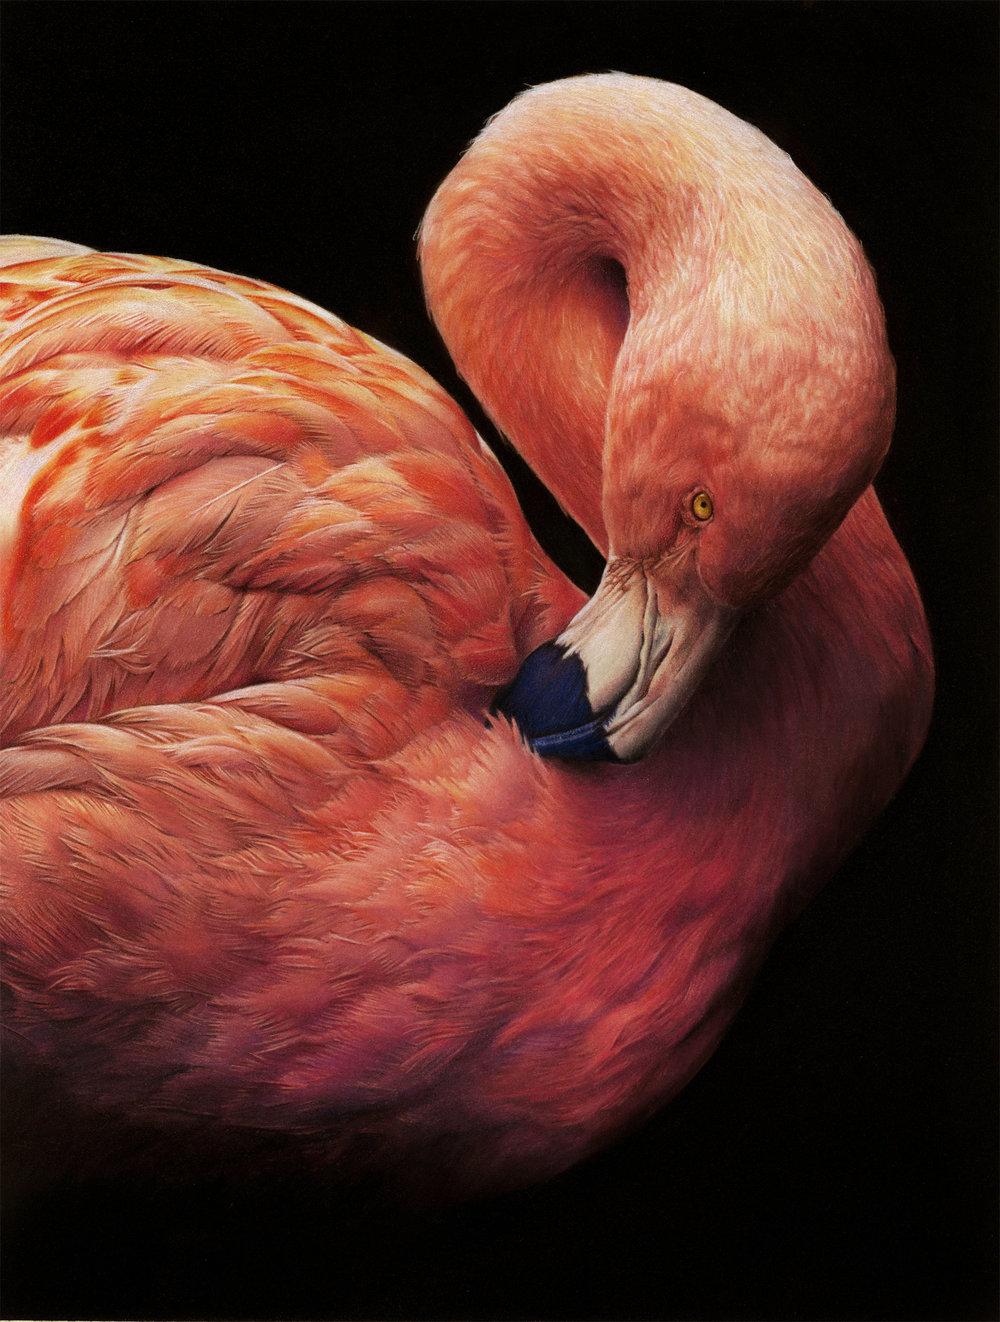 Nicola Wilkinson, Pretty in Pink, Coloured Pencil on Fisher400 Paper, 44.5cm x 33,5cm x 0.2cm,  https://www.facebook.com/nicolawilkinsonart/